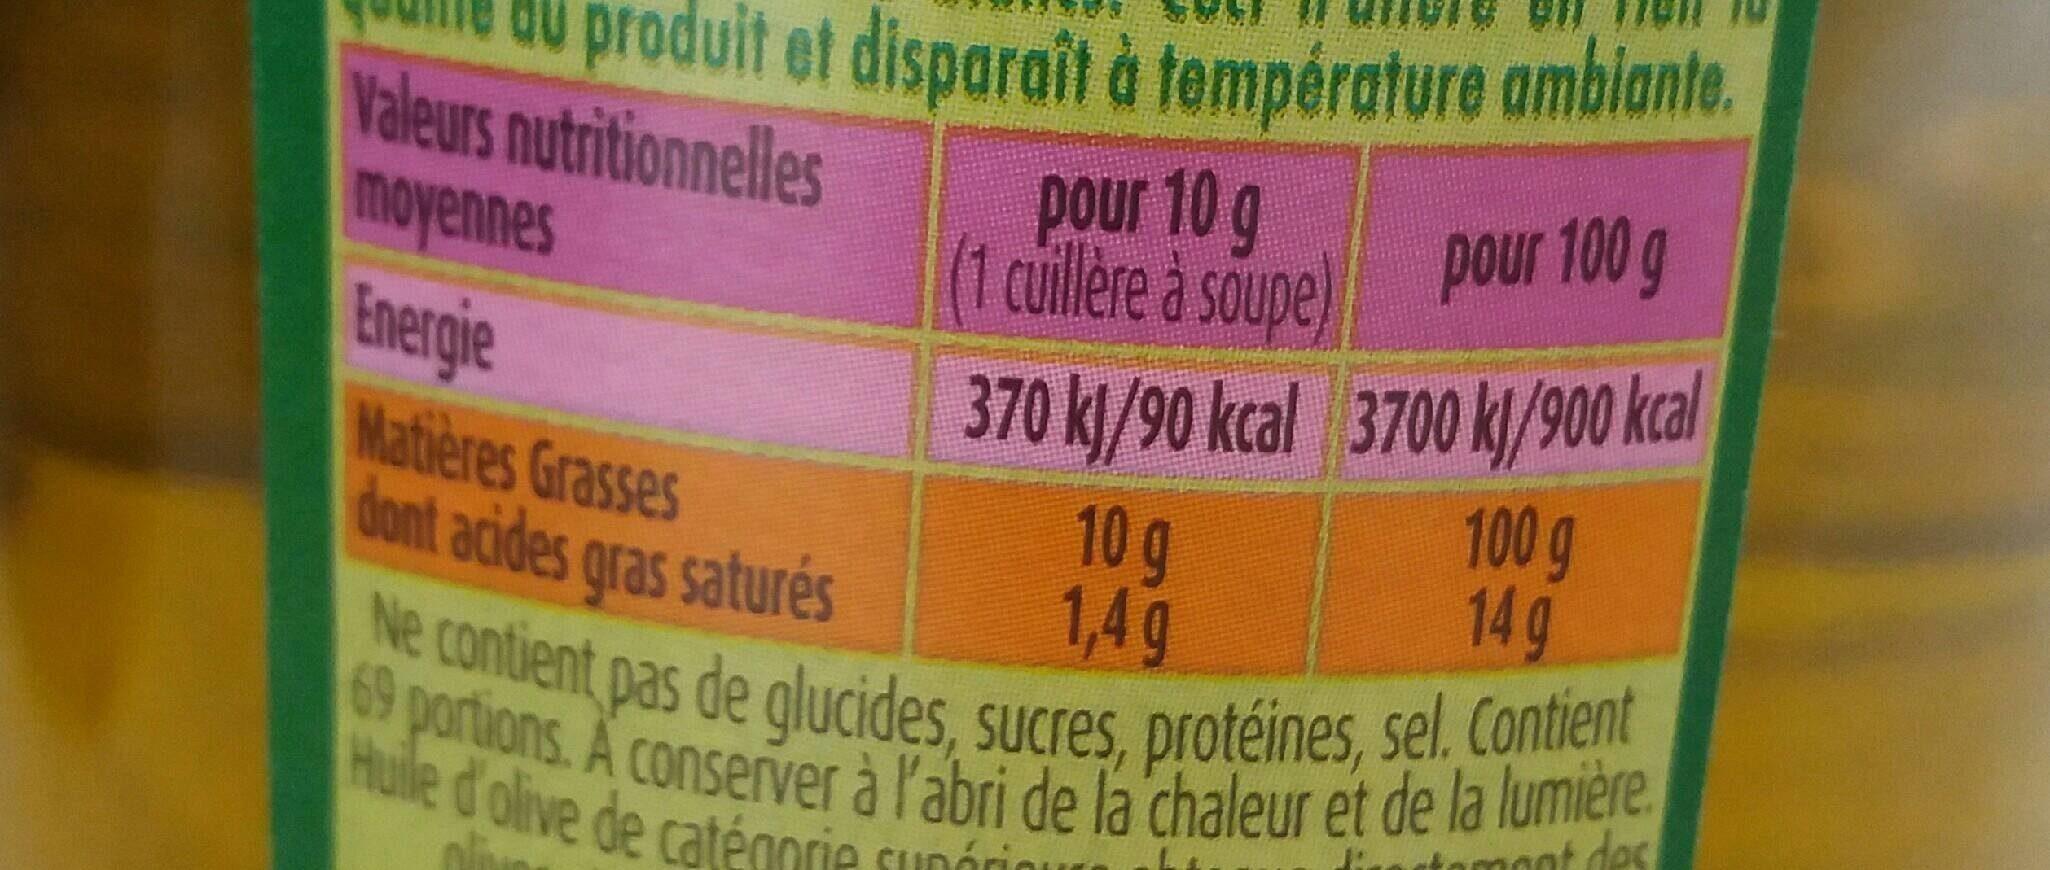 HUILE D'OLIVE PUGET VERTE PUISSANTE - Informations nutritionnelles - fr